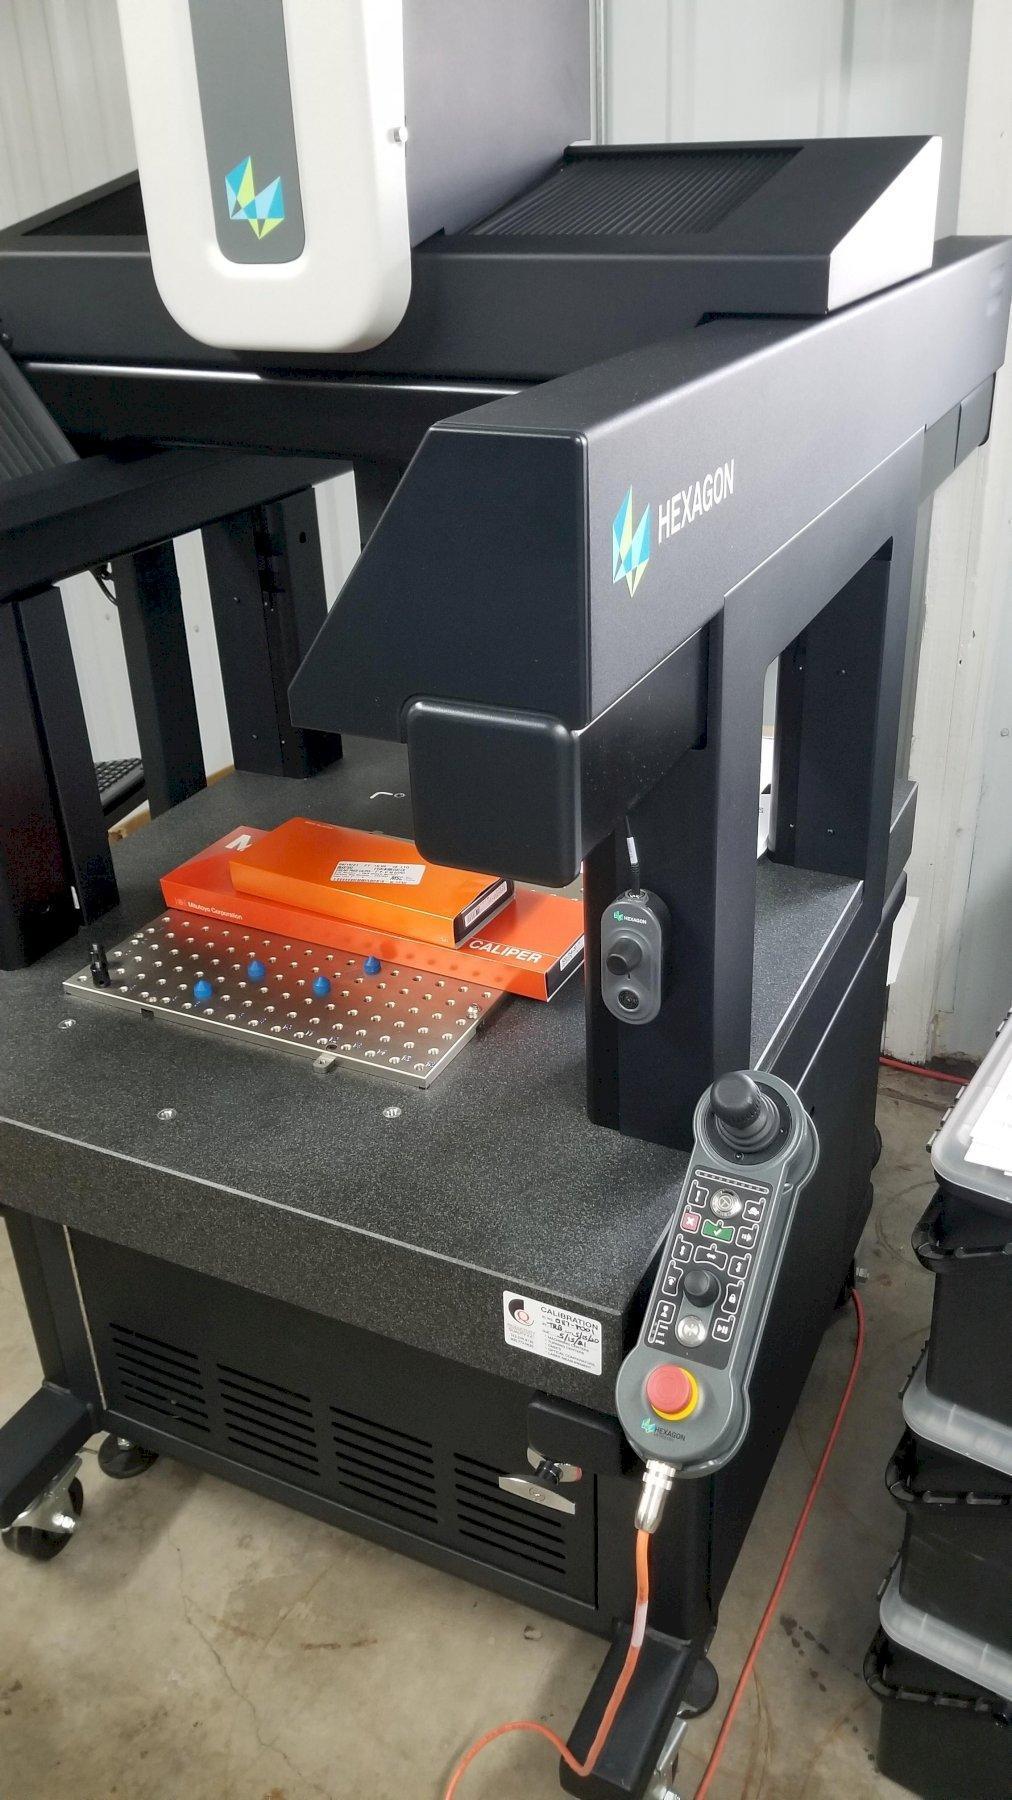 BROWN & SHARPEBrown & Sharpe Global 4.5.4 UA Shop Floor DCC Coordinate Measuring Machine (CMM)(#33221)